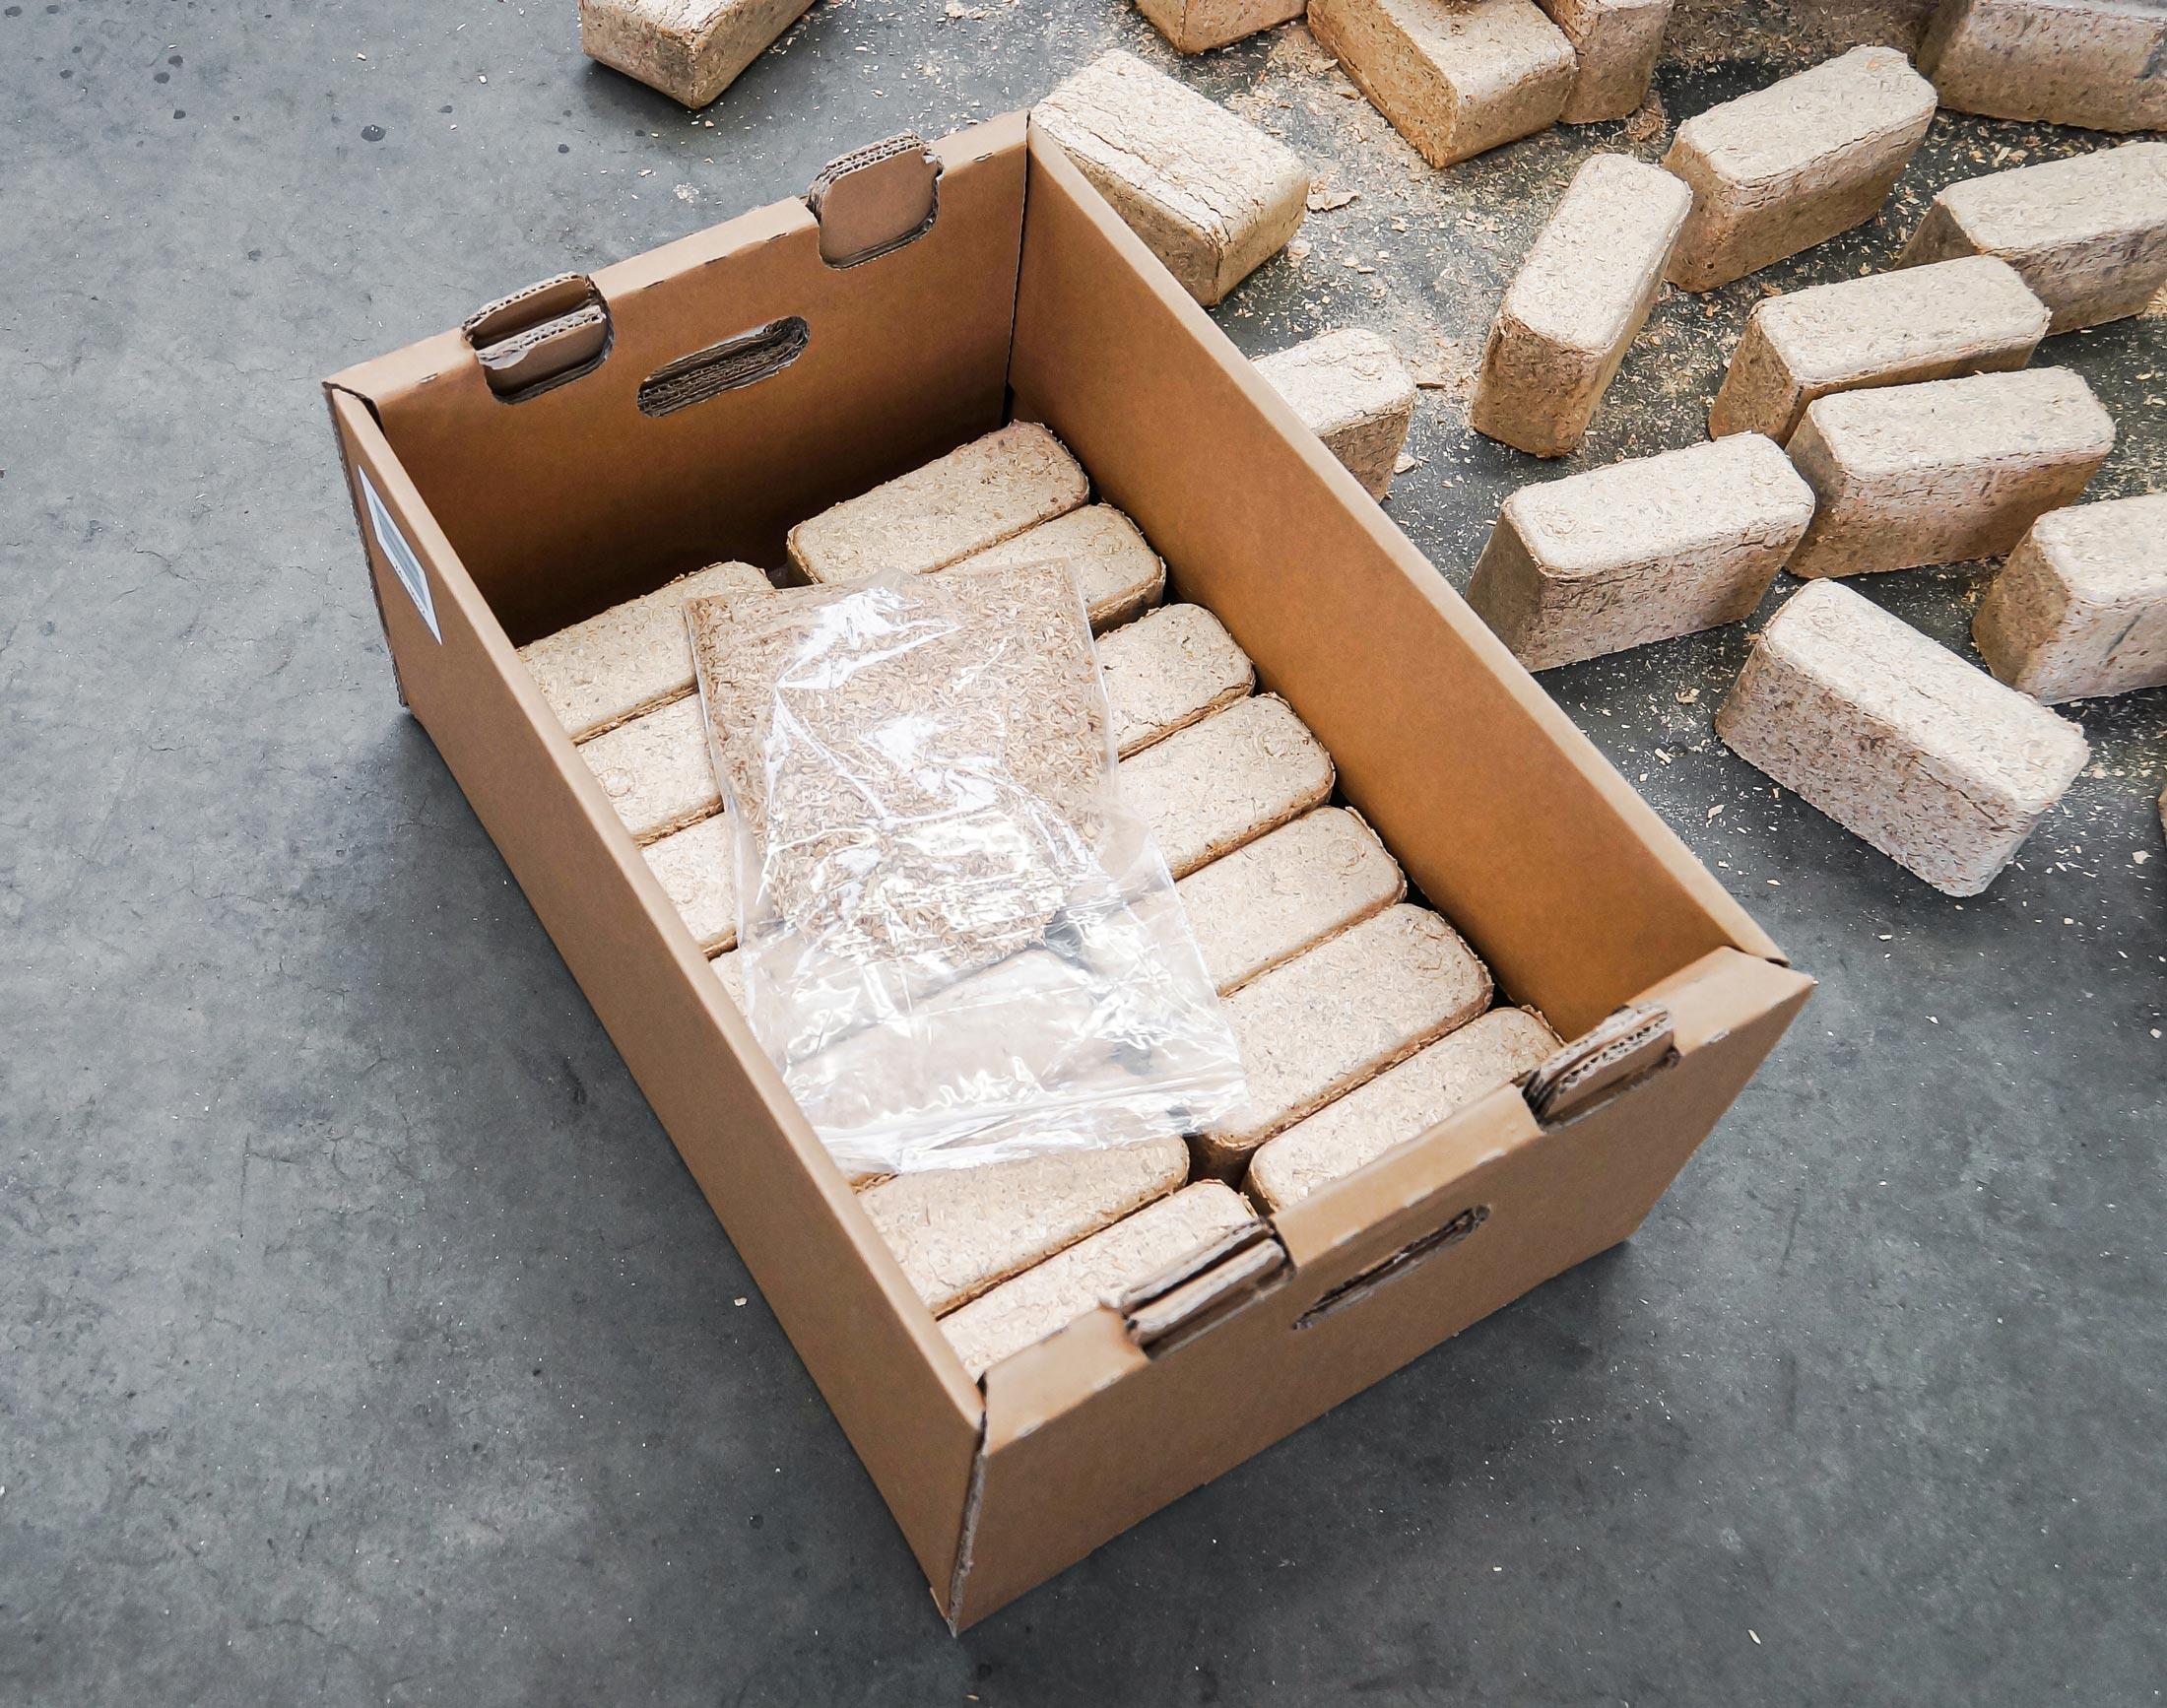 Rectangular hardwood briquettes are prepared for shipment